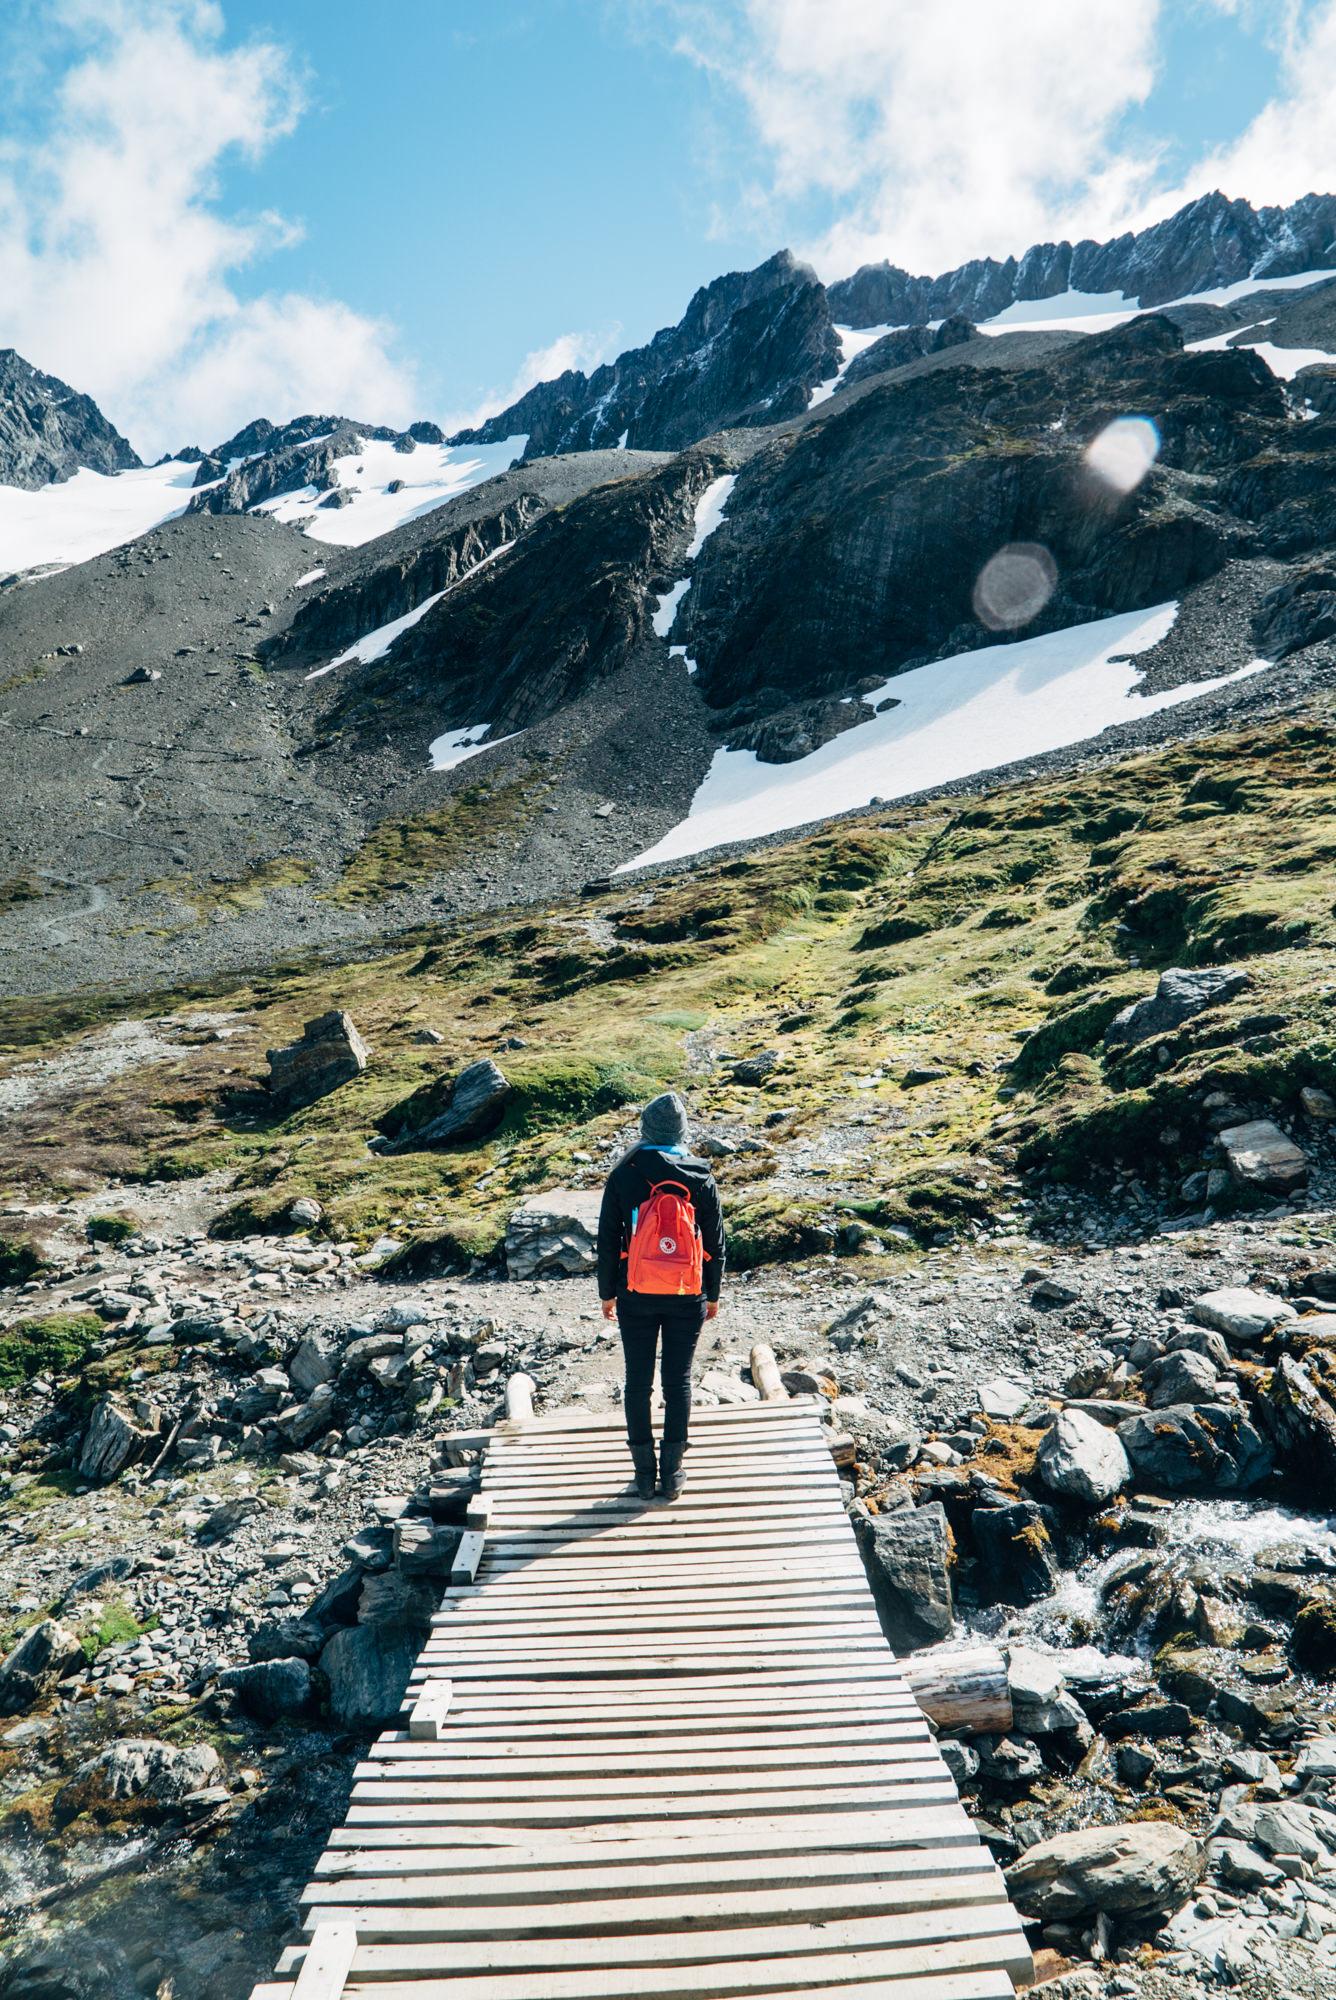 wrenee-ushuaia-argentina-7.jpg